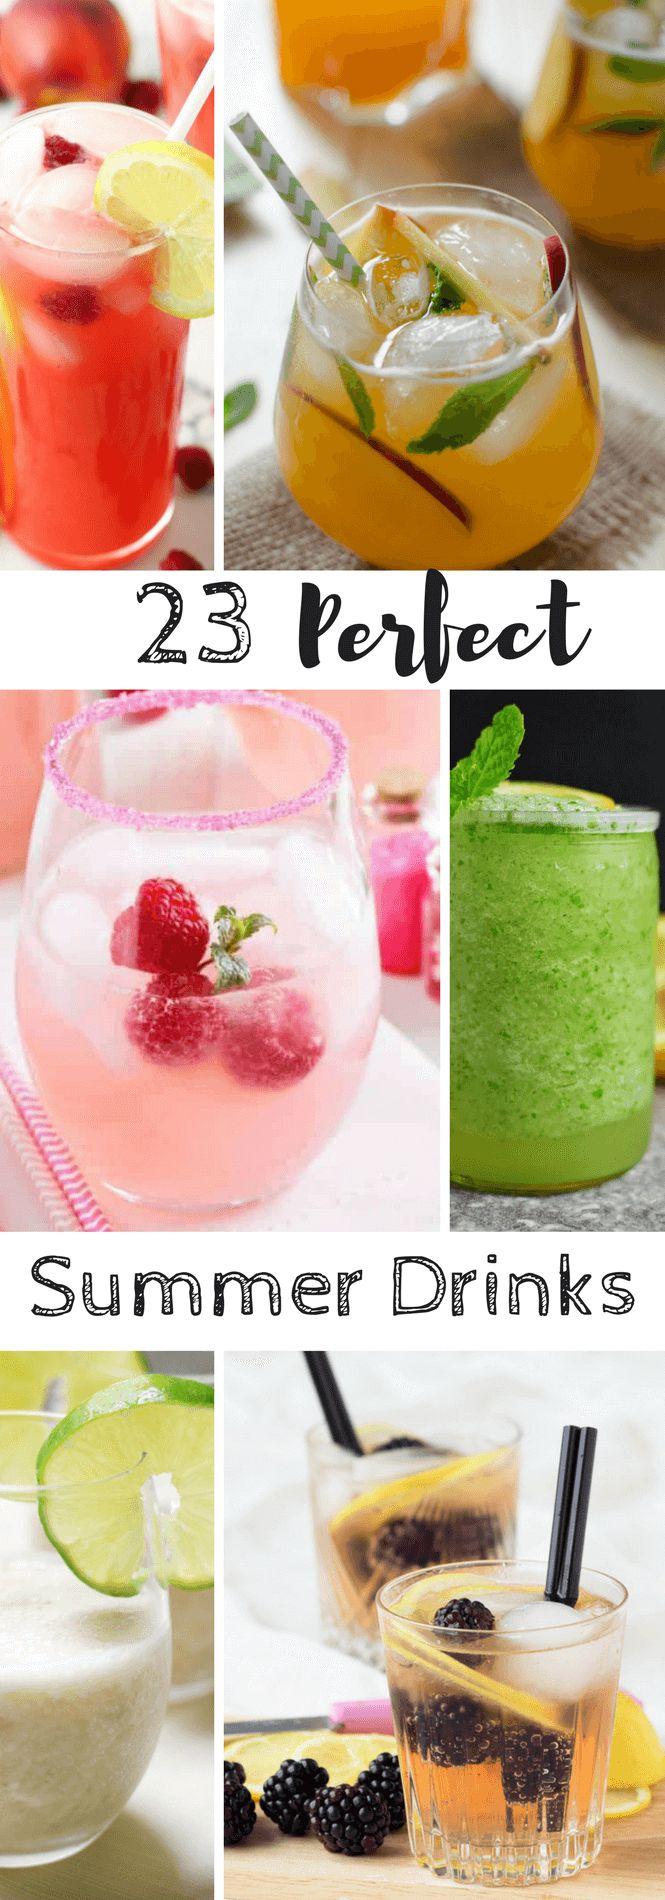 Summer drinks non-alcoholic